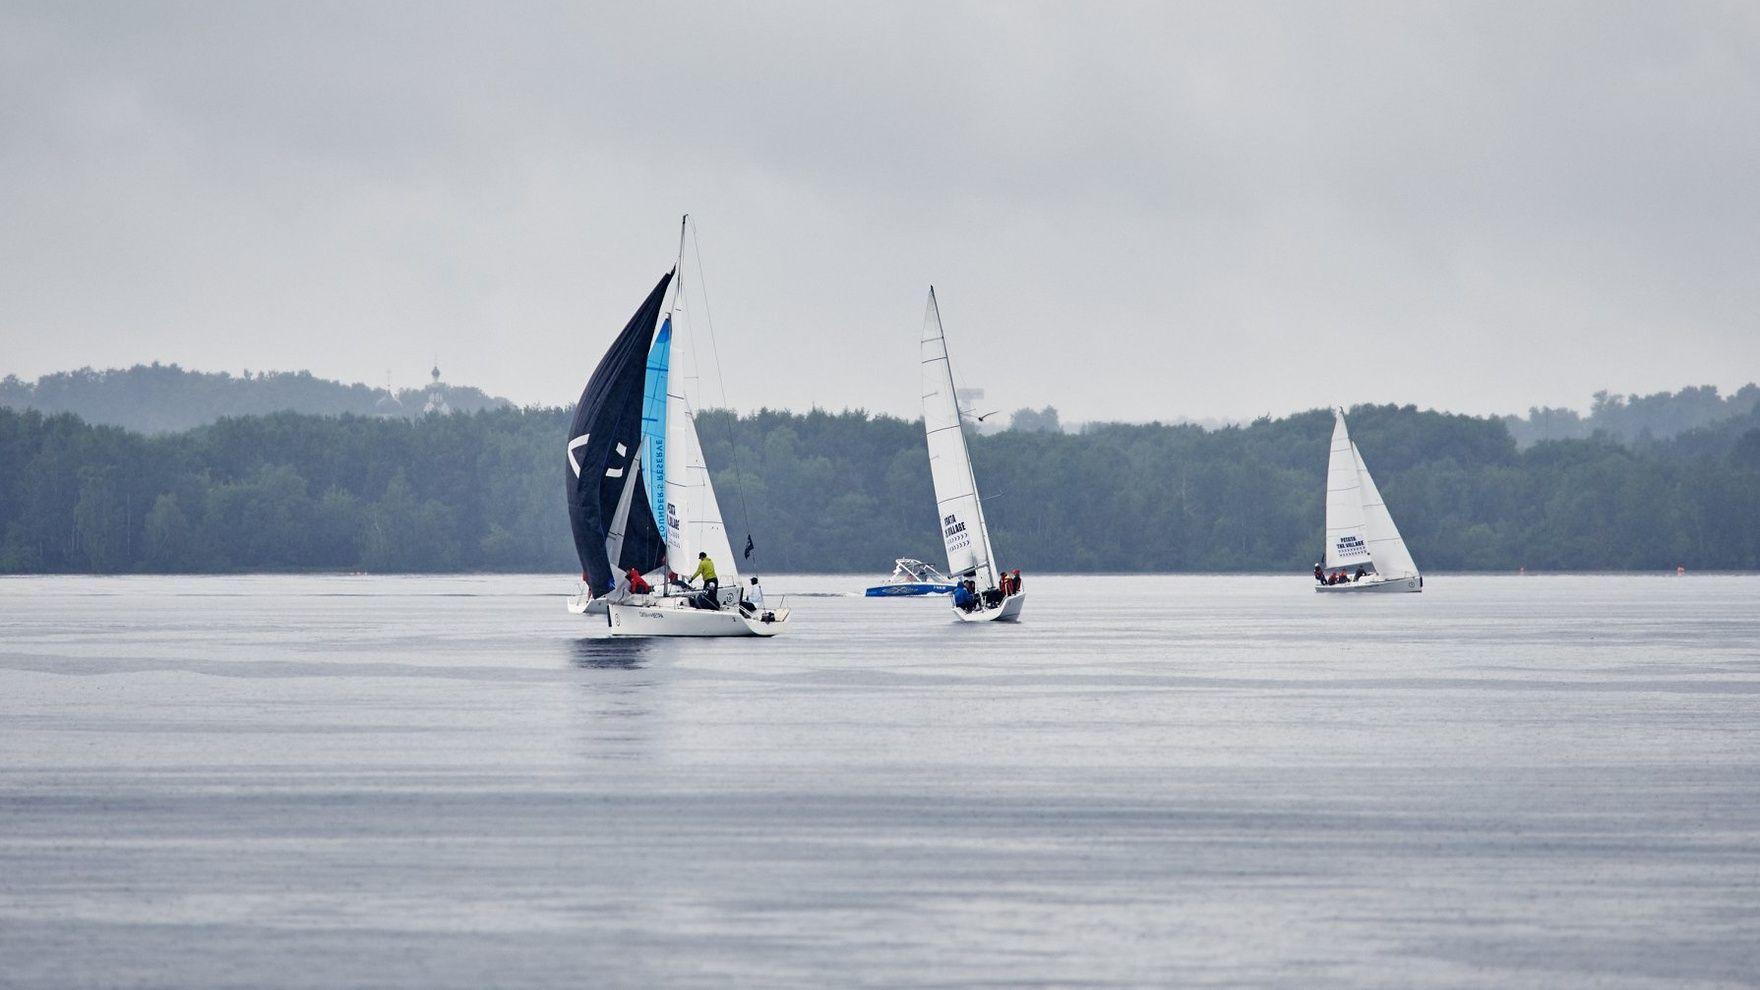 Путешествия по Финскому заливу: Питер - Крондштат